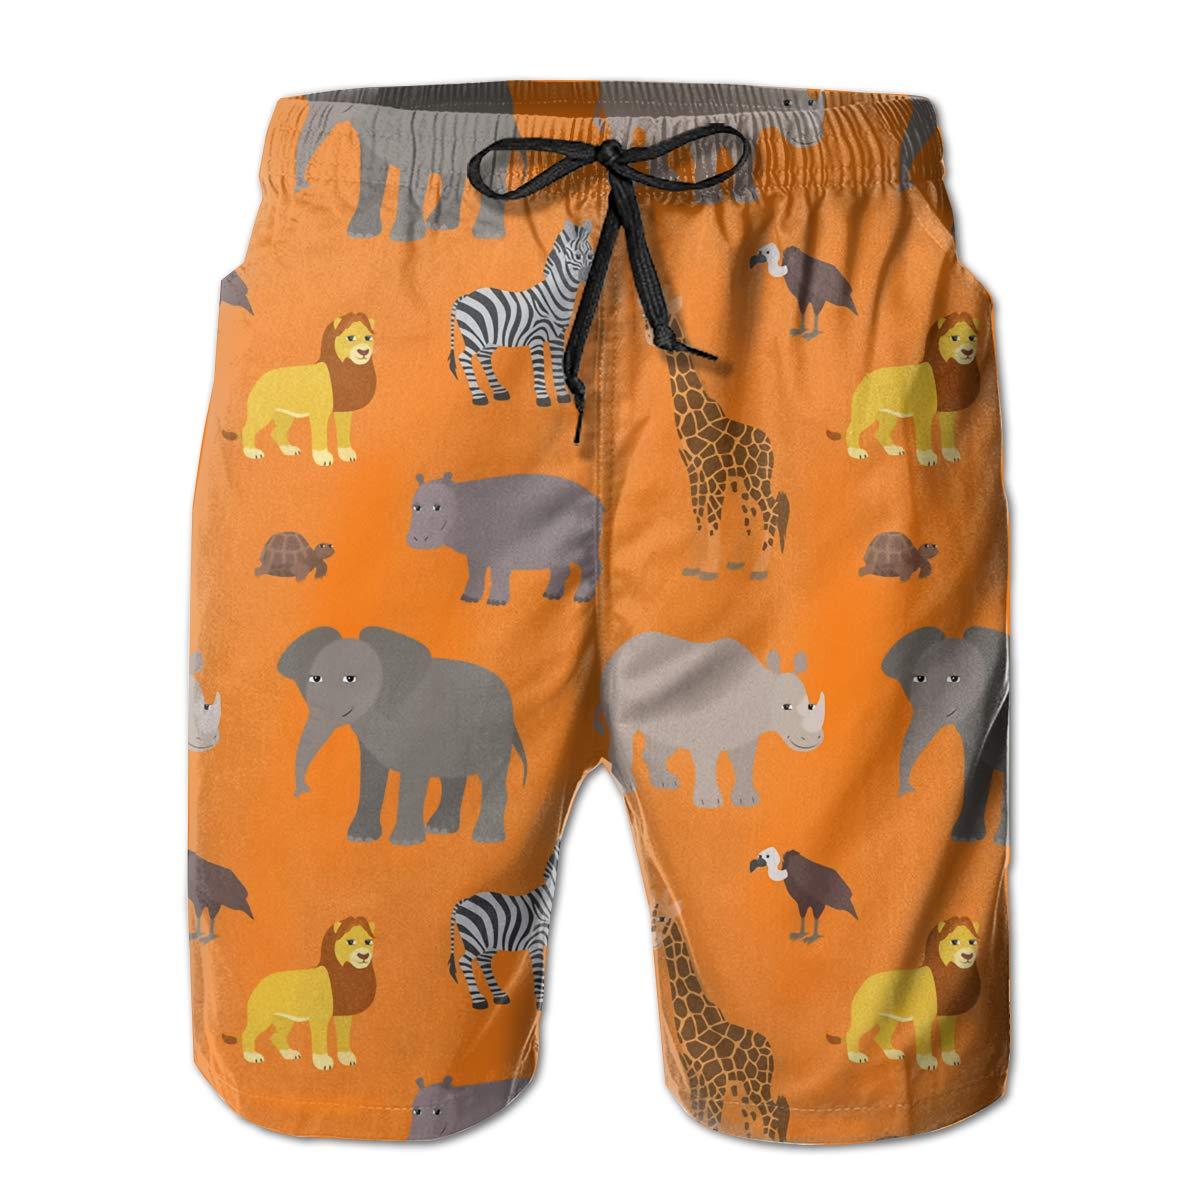 SARA NELL Mens Swim Trunks Cartoon African Animals Lion Zebra Surfing Beach Board Shorts Swimwear